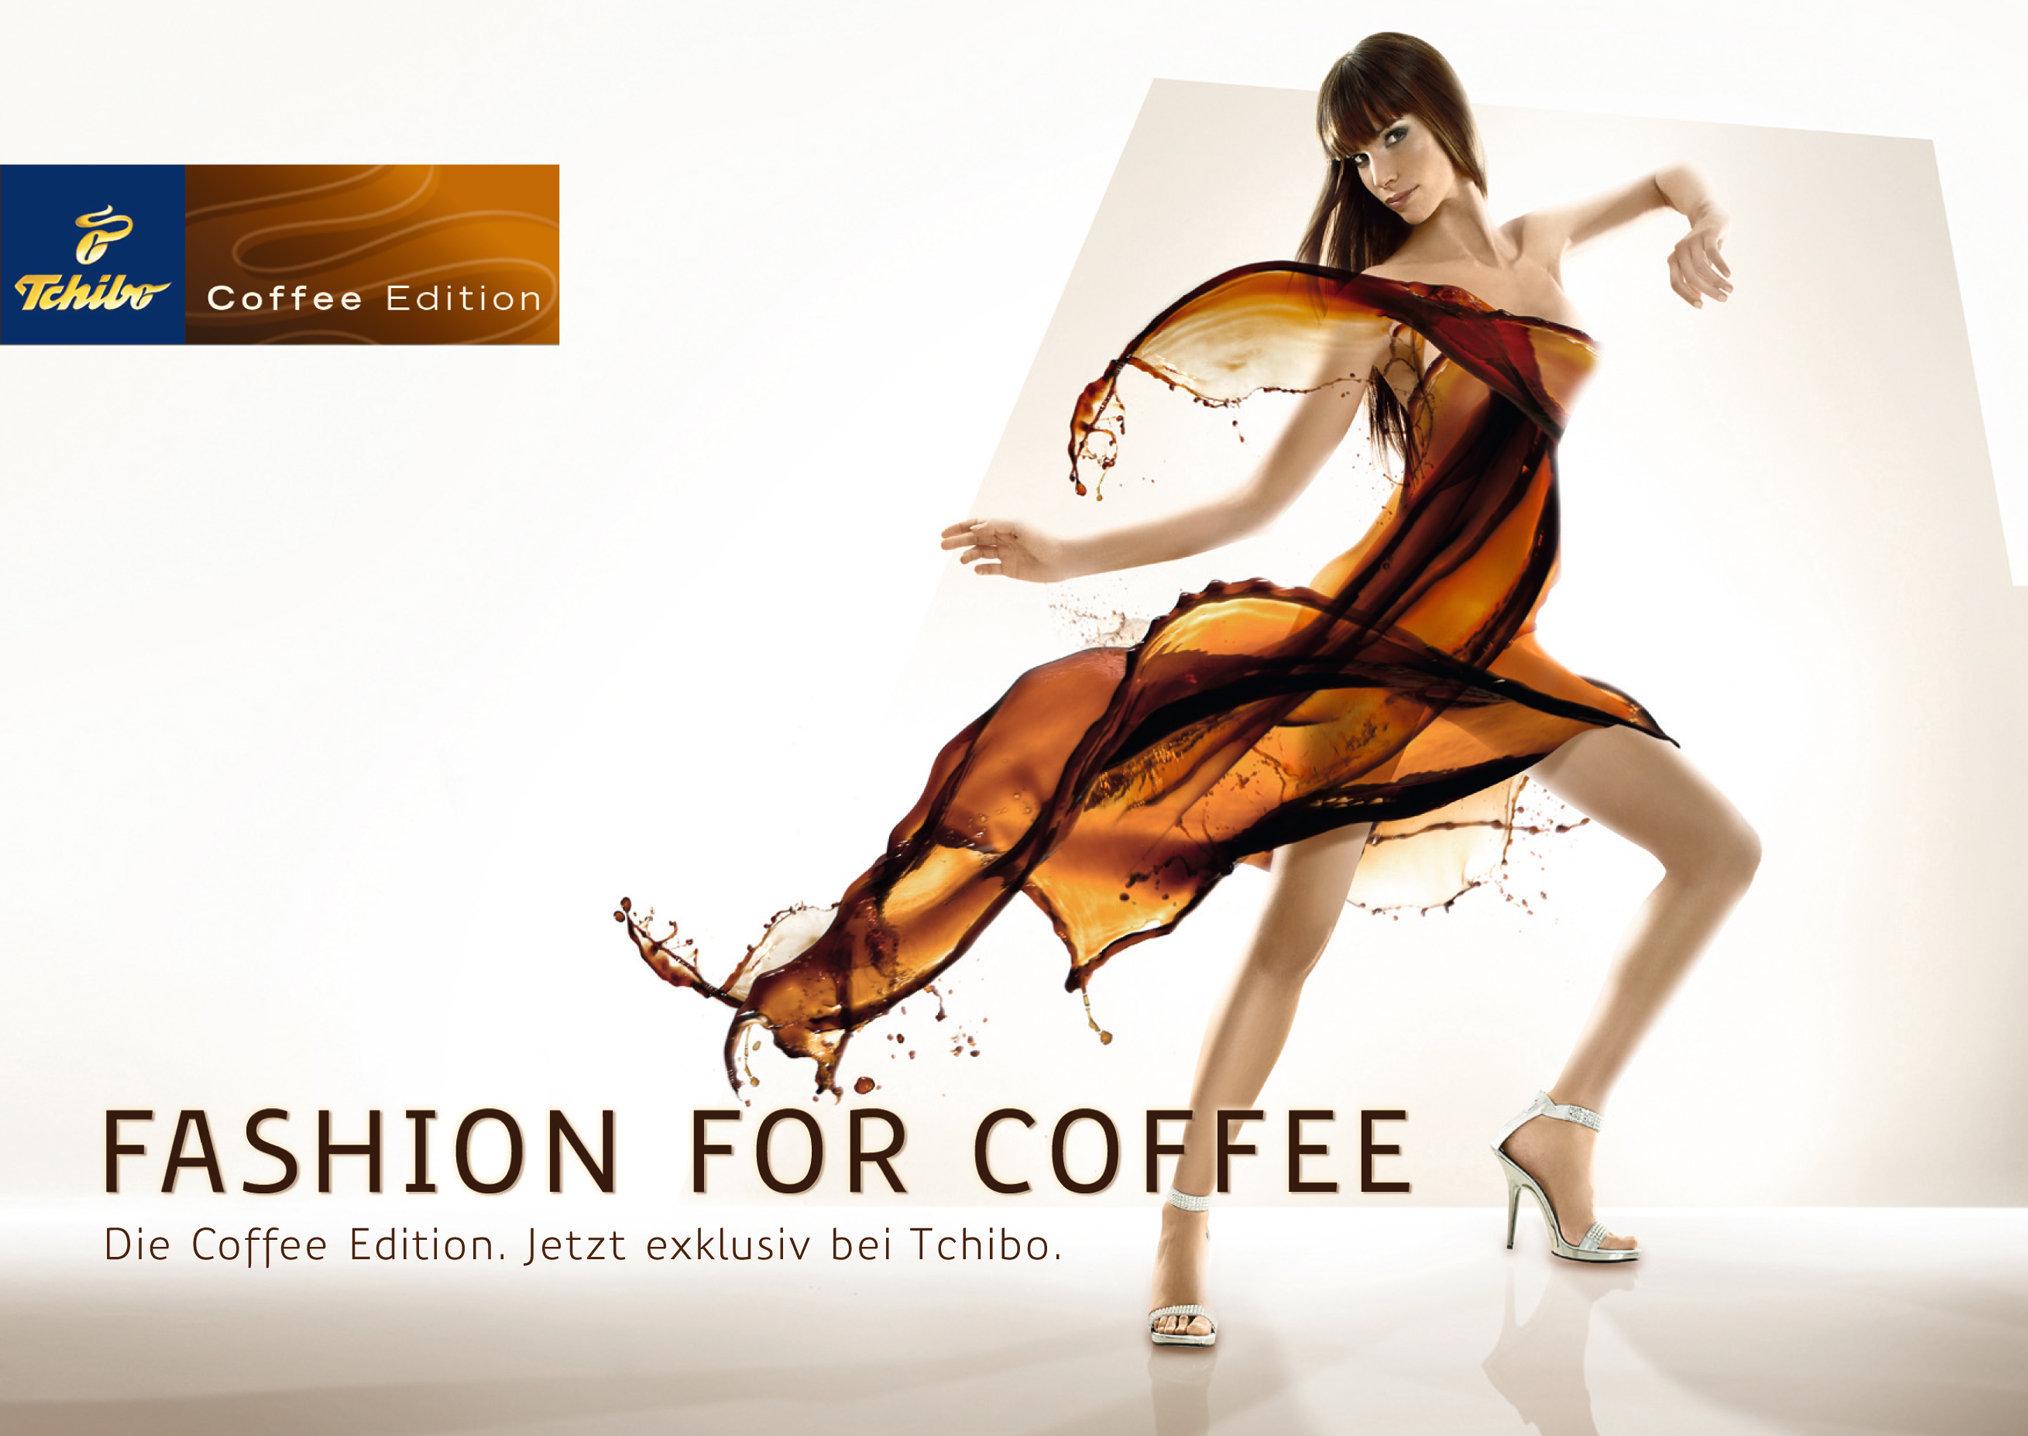 Tchibo / Die Coffee Edition